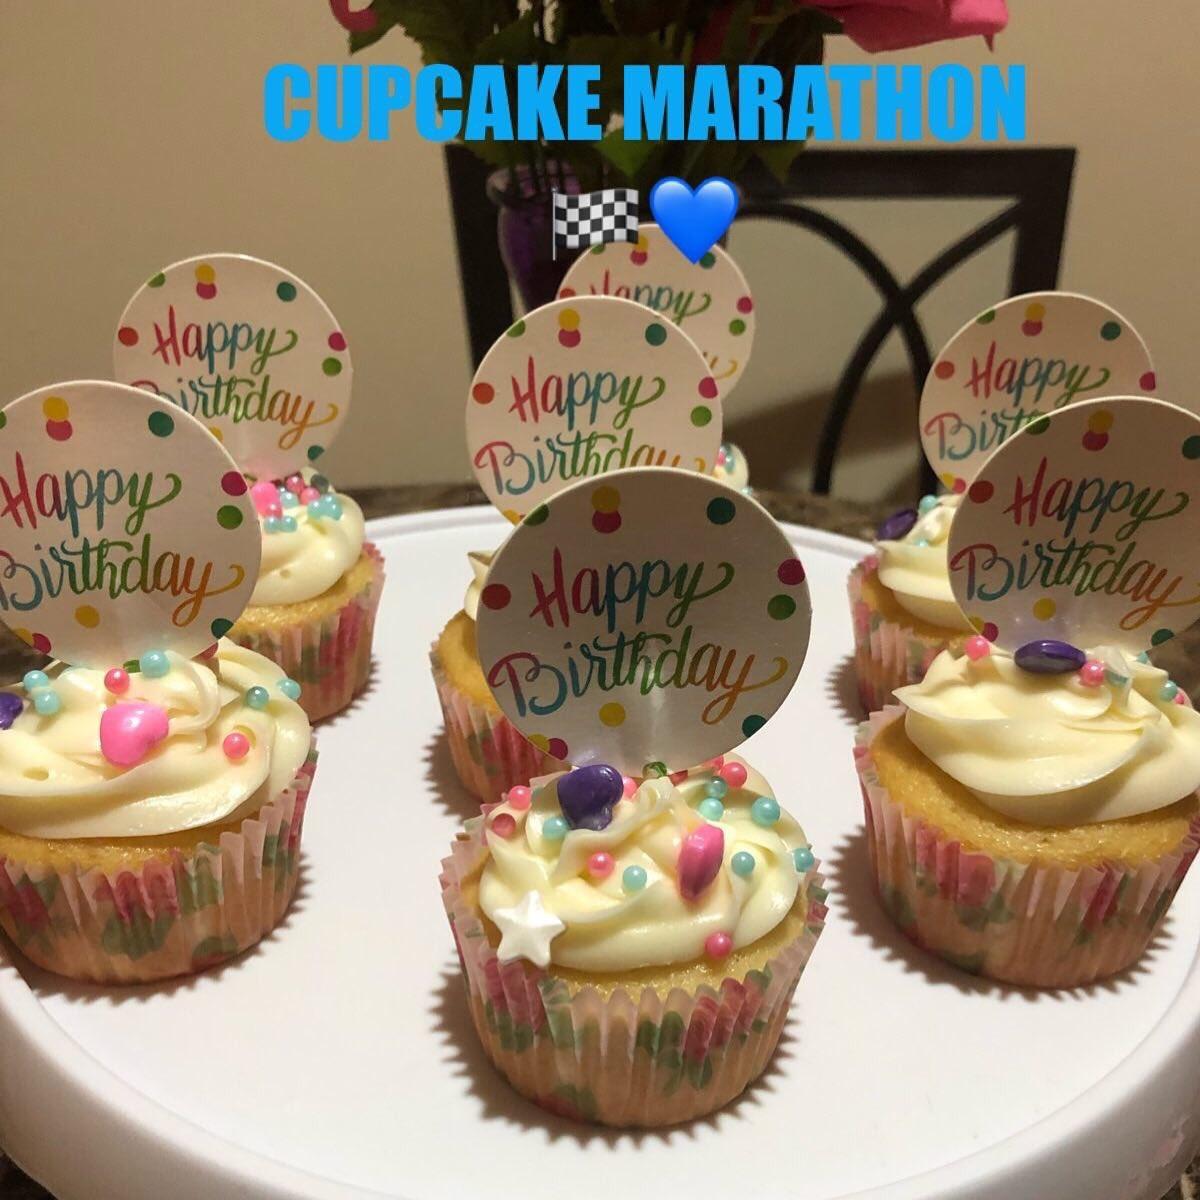 Tremendous Cupcake Marathon Llc V Twitter Happy Birthday Funny Birthday Cards Online Benoljebrpdamsfinfo